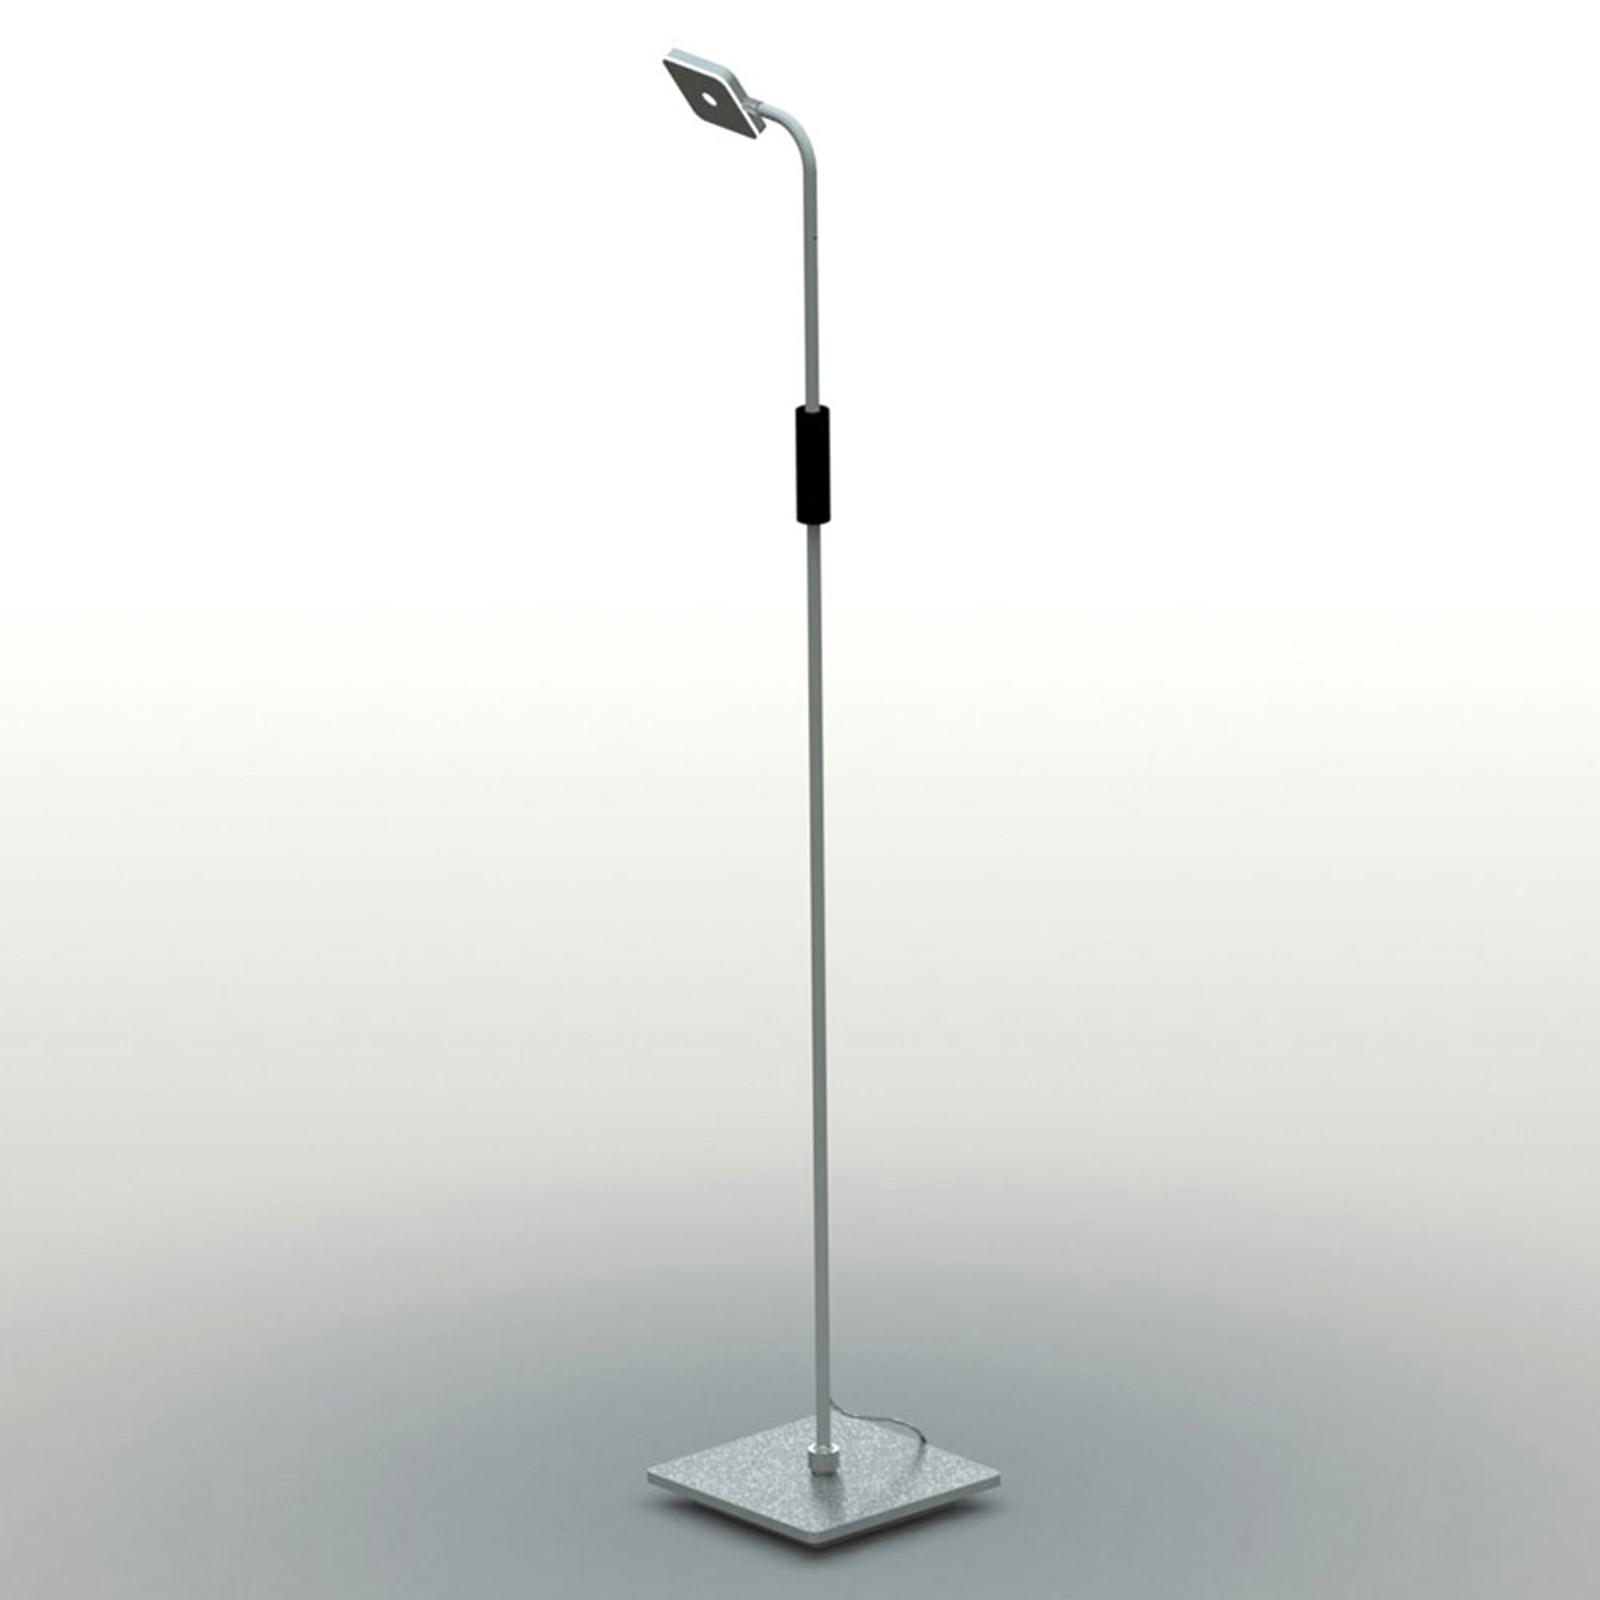 Bopp Move - LED-Stehleuchte mit Akku, aluminium